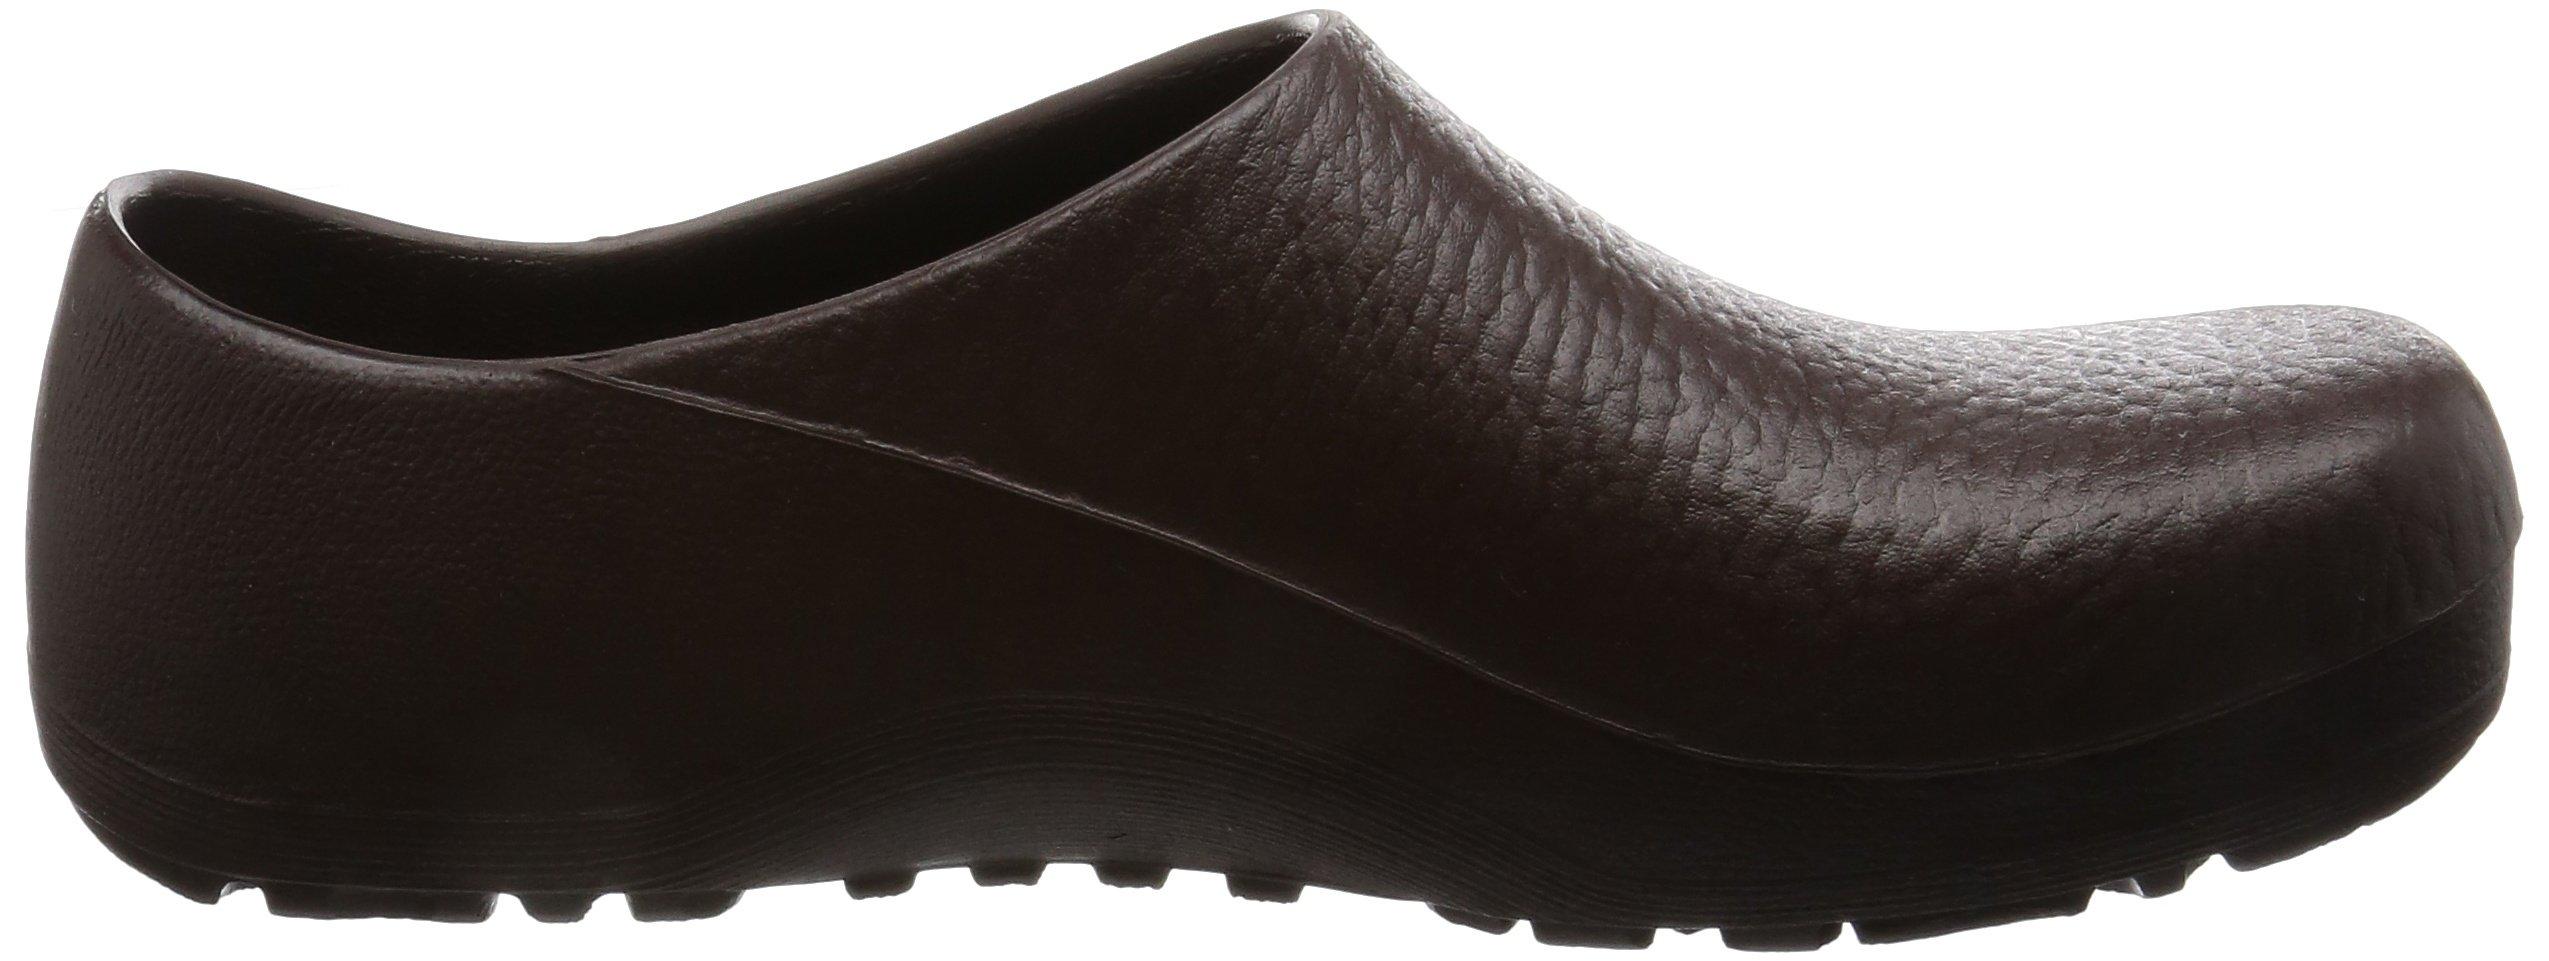 Birkenstock Men´s Profi-Birki Brown Alpro-Foam Sandals 40 EU (M7/L9 US) R 074061 by Birkenstock (Image #7)